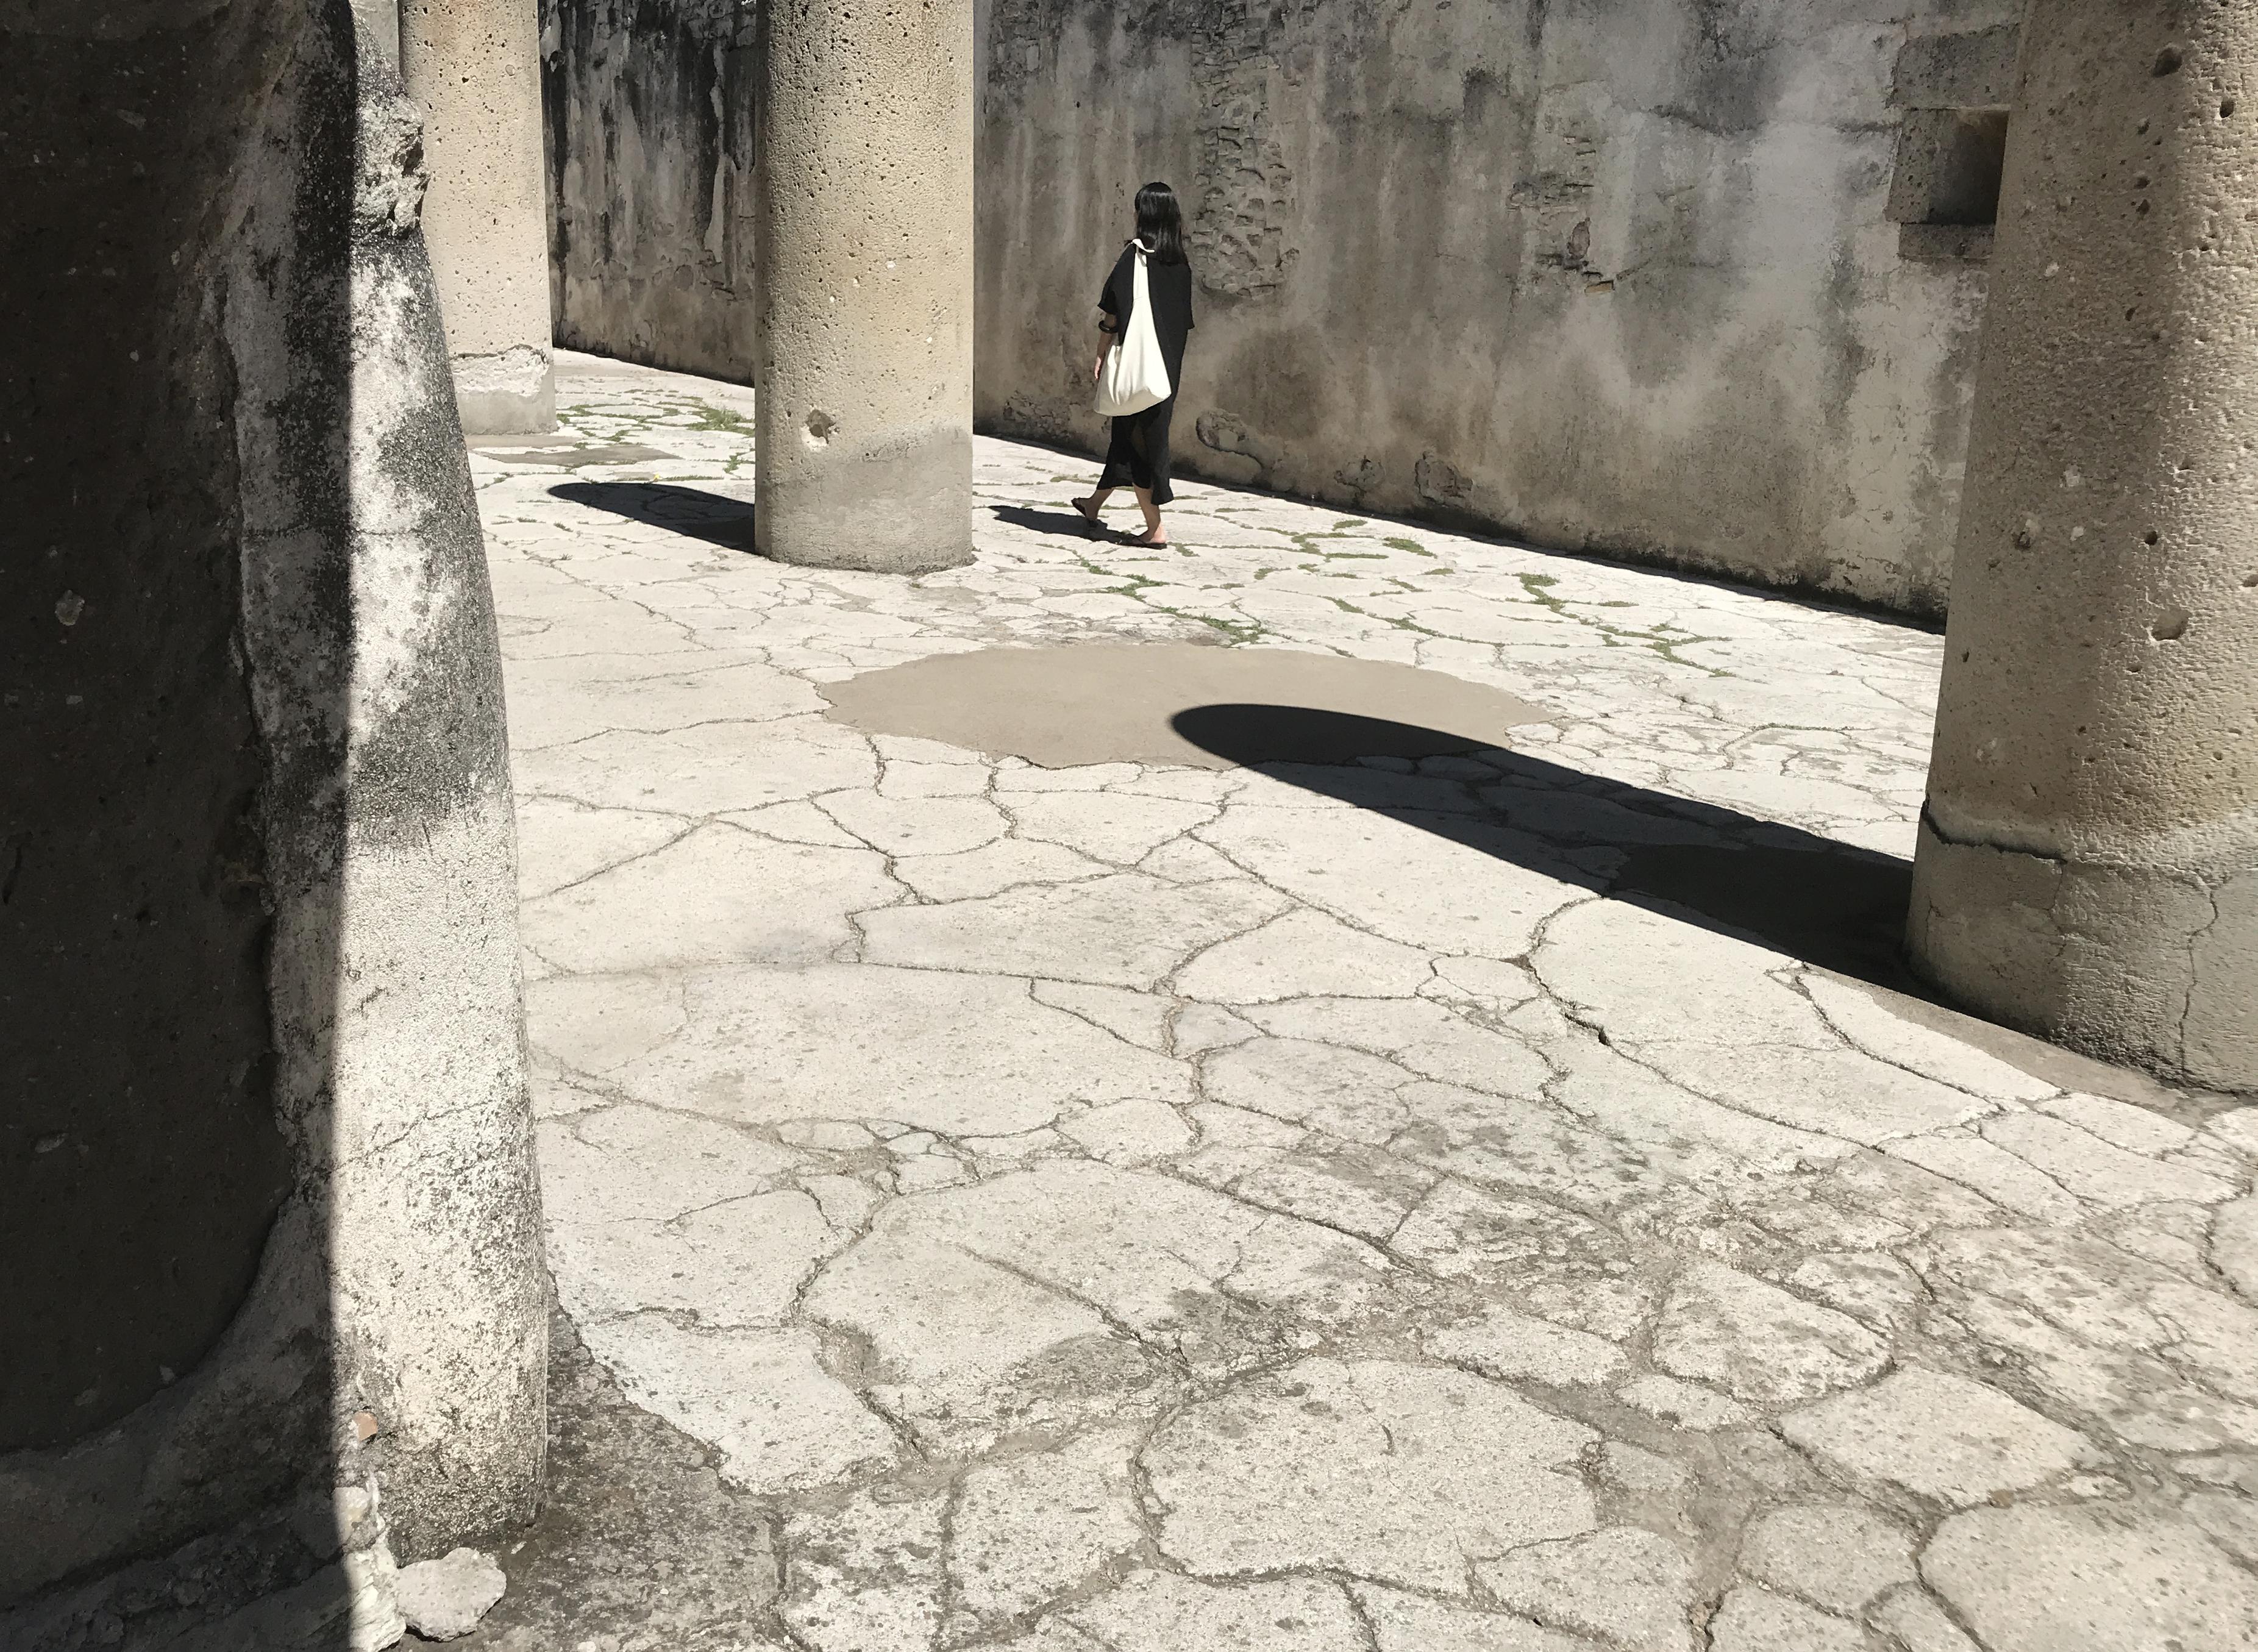 Mitla in Oaxaca, Mexico.